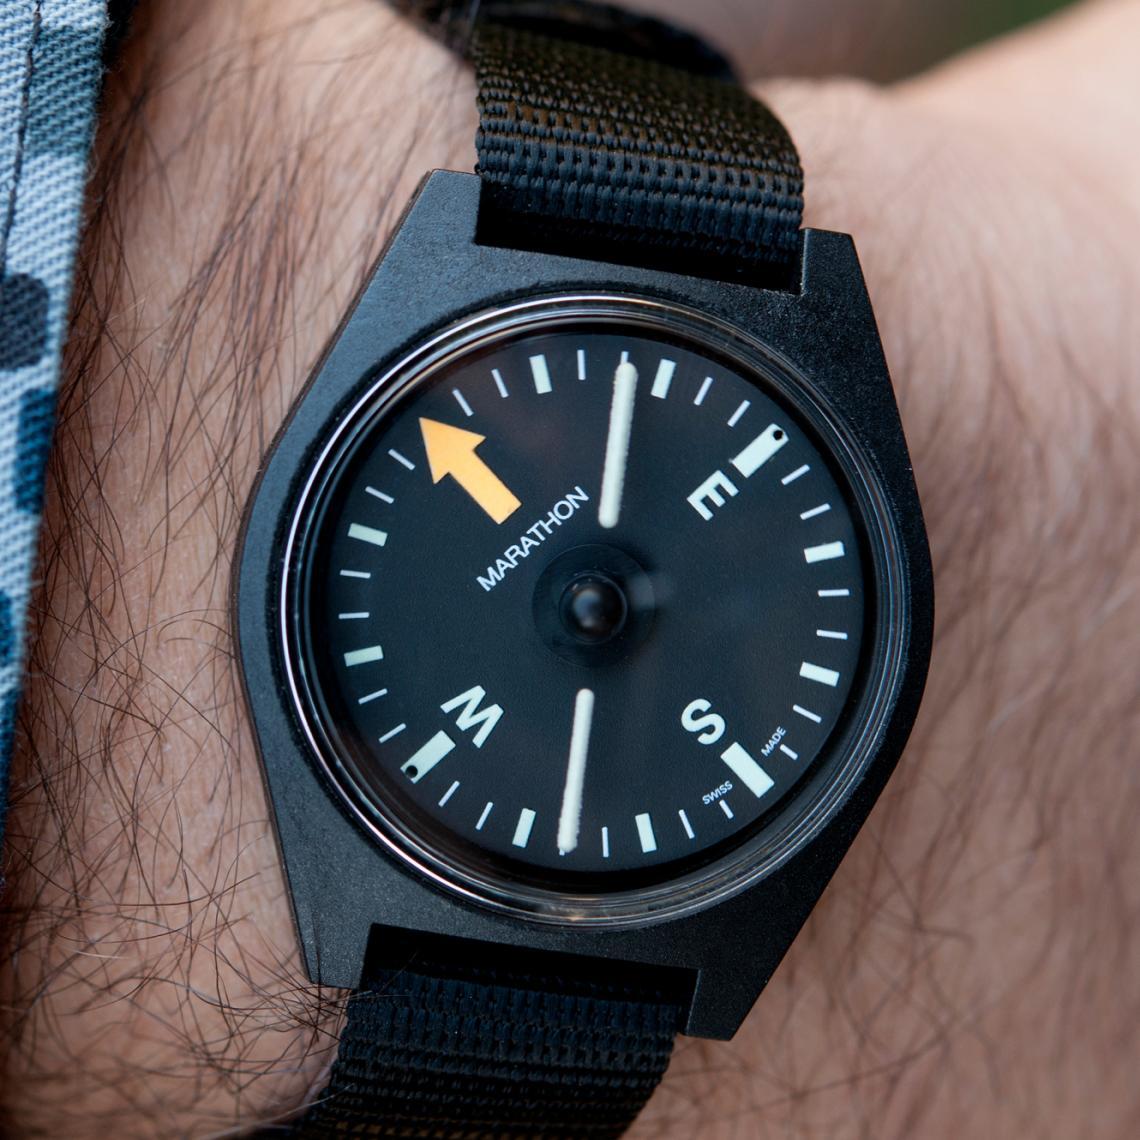 Marathon Unmounted Wrist Compass ⋆ Windy City Watch Collector